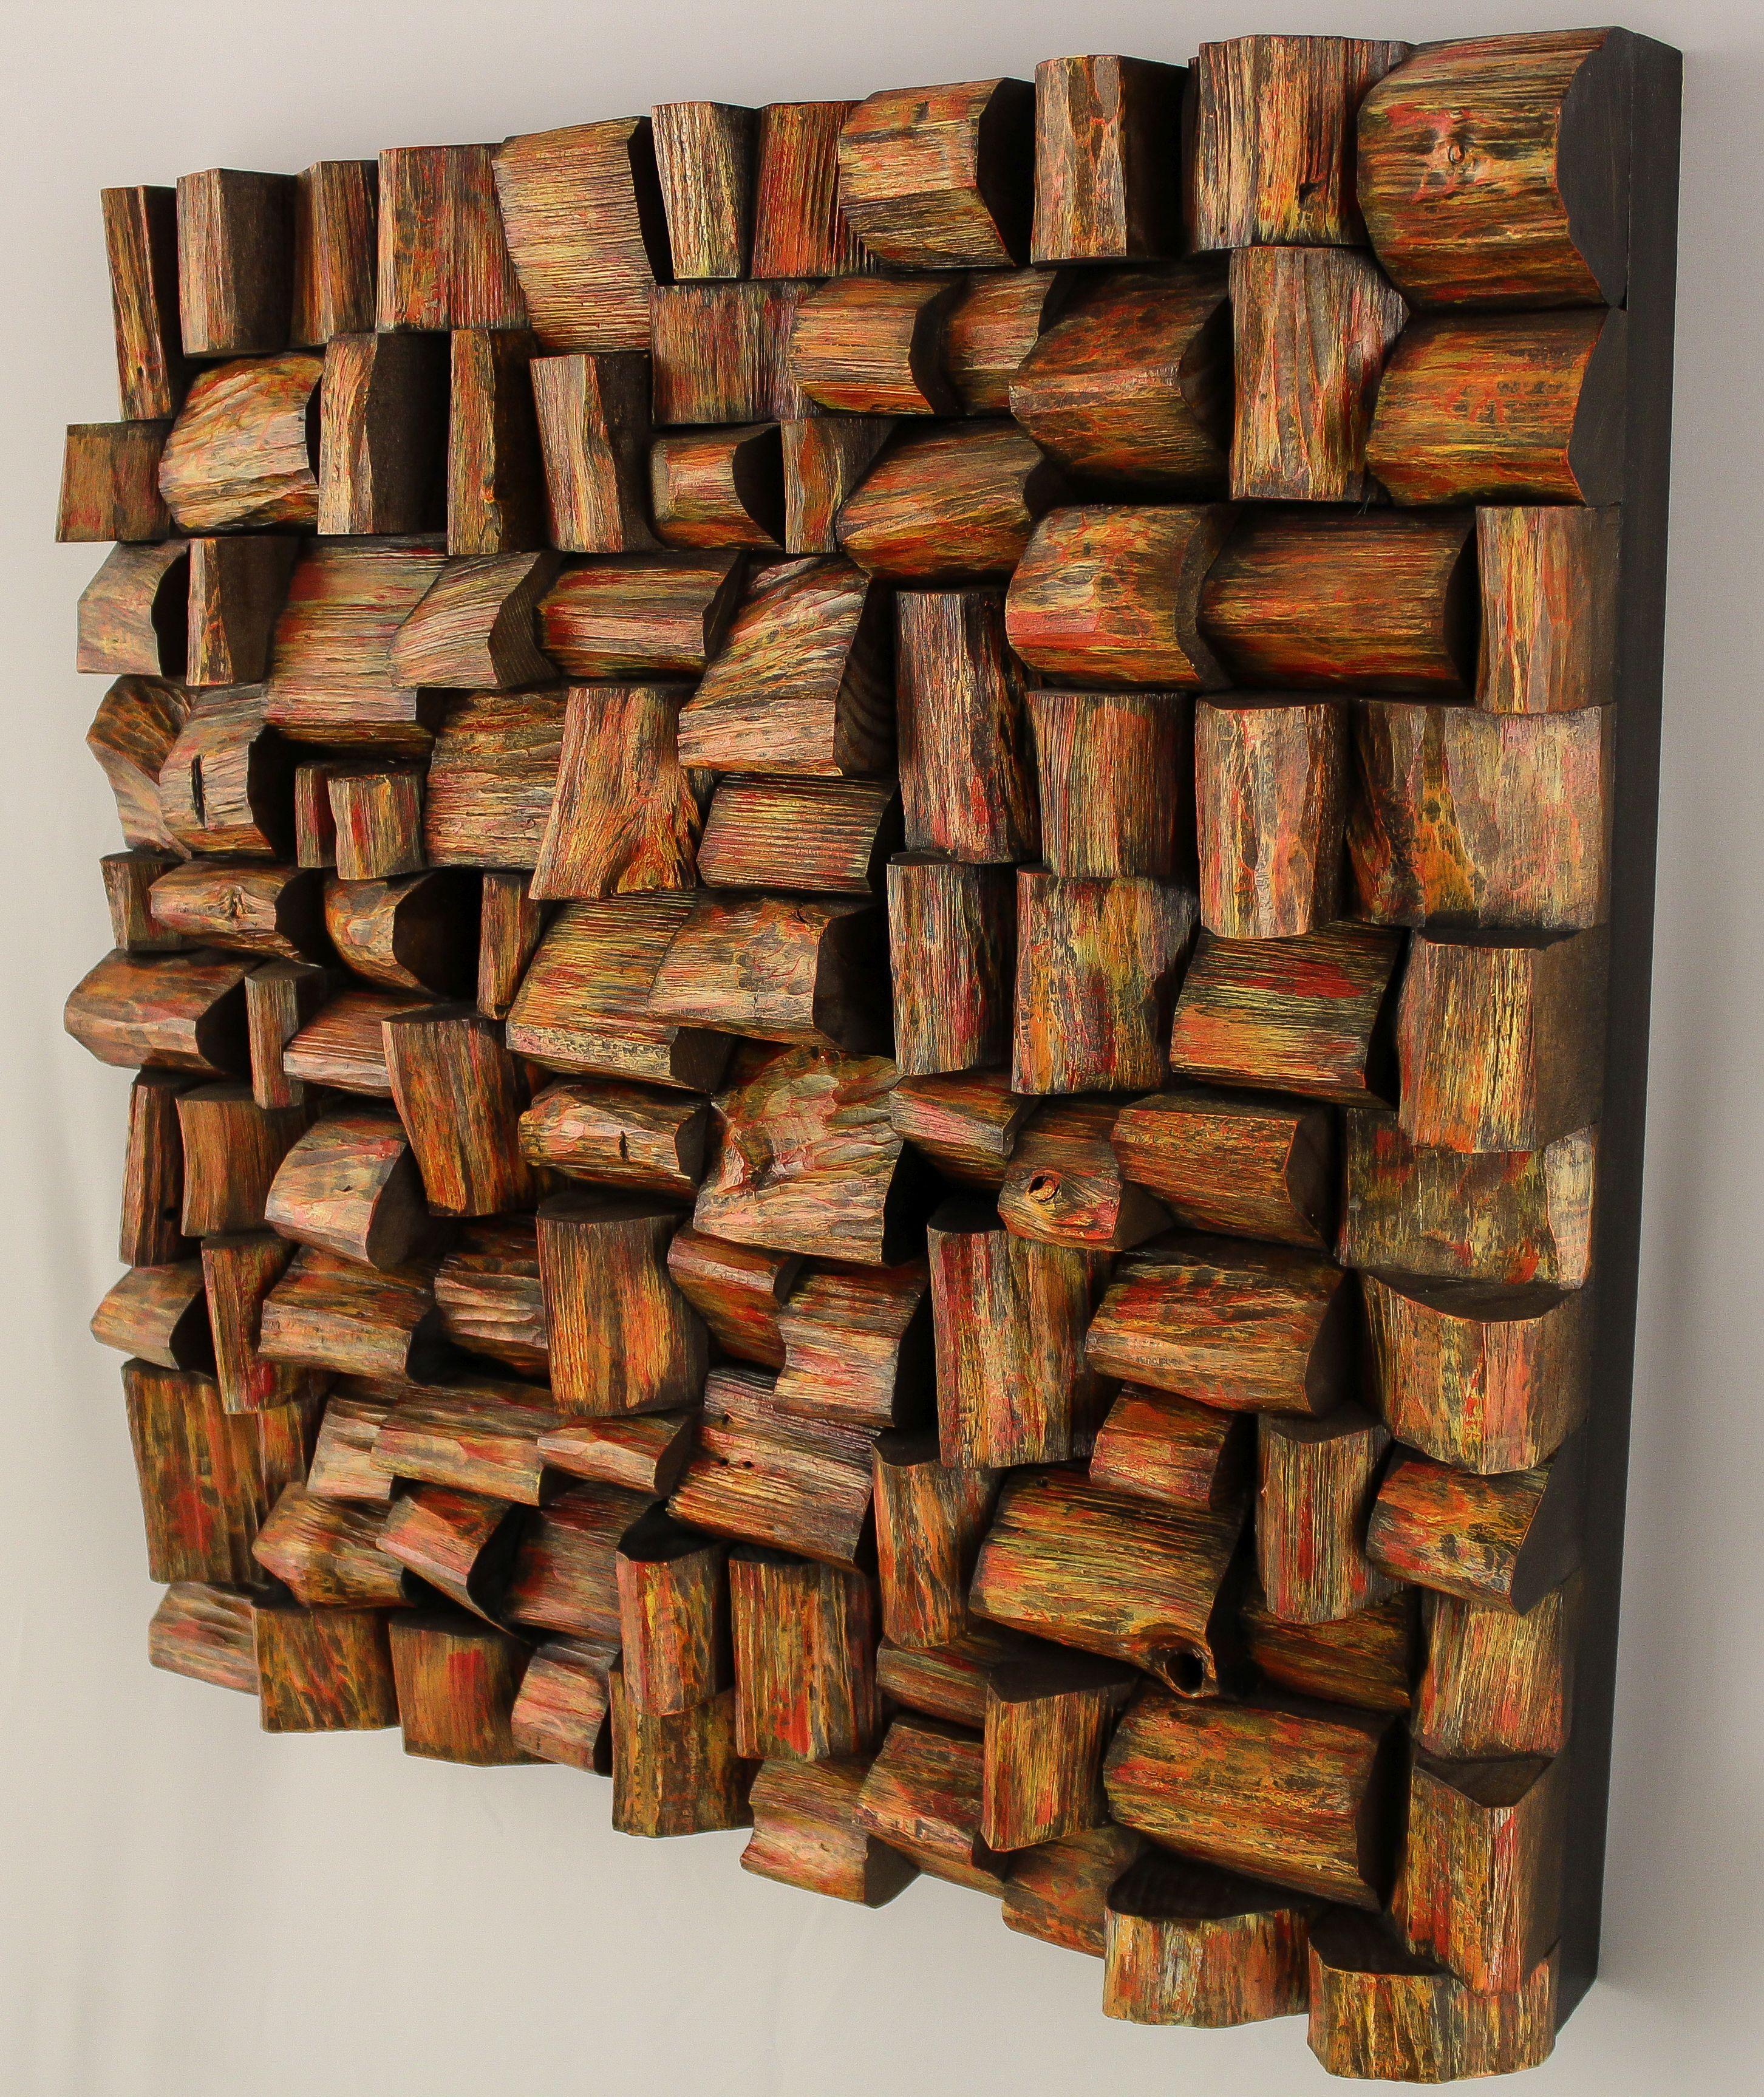 Acoustic Art Wooden Wall Decor Acoustic Panels Wooden Art